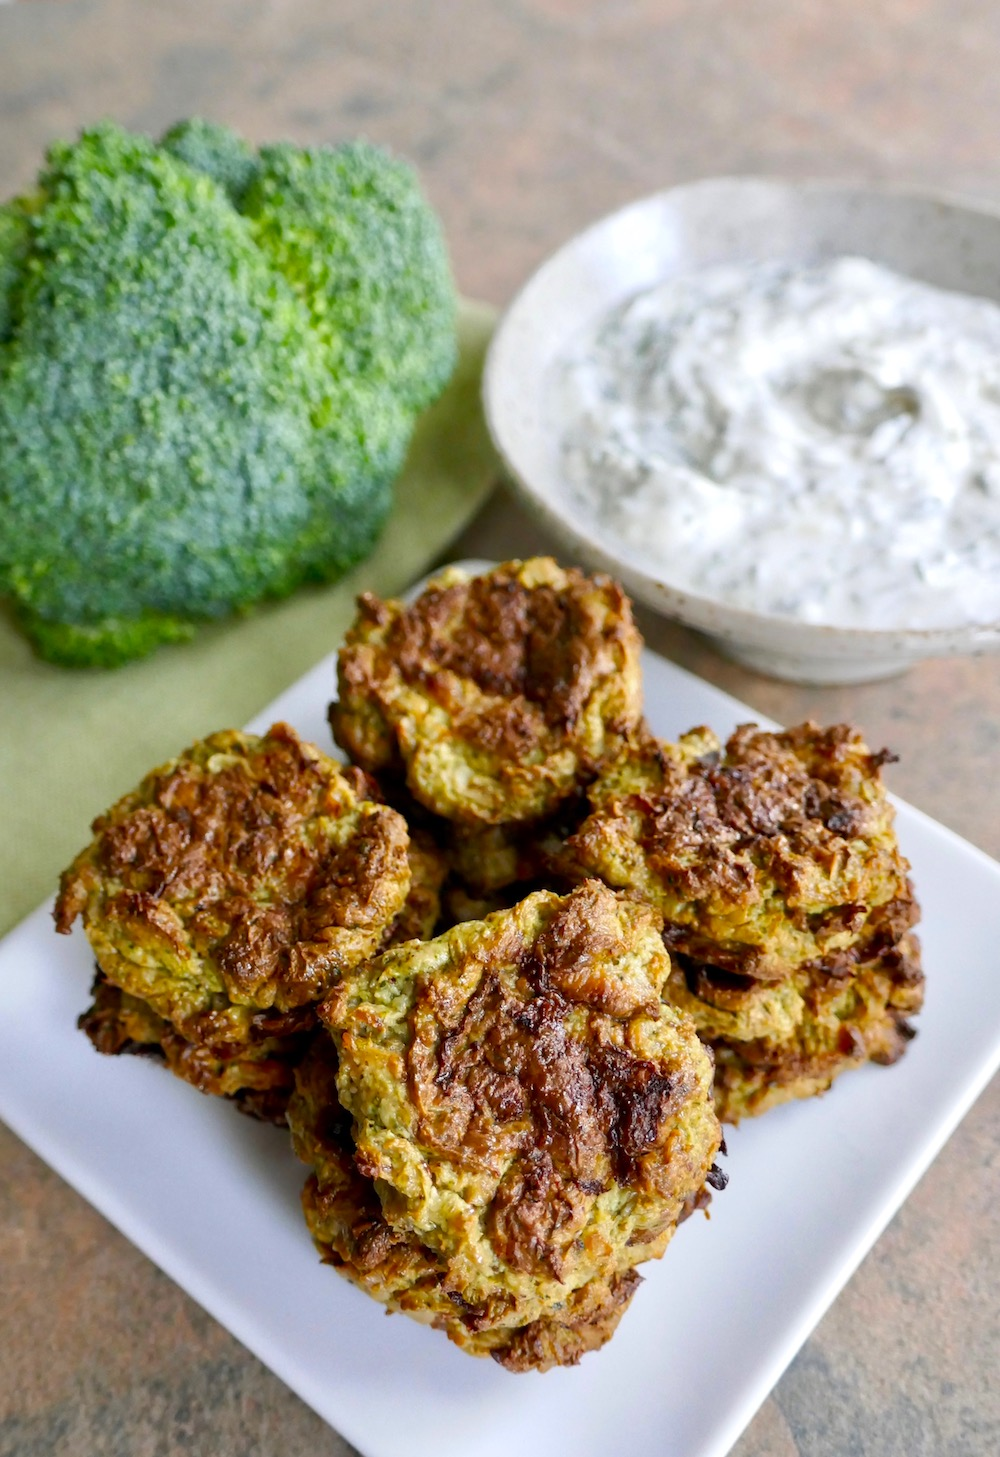 Paleo Broccoli-Cauli Sausage Tots - easy and fast recipe in the Instant Pot | TastingPage.com